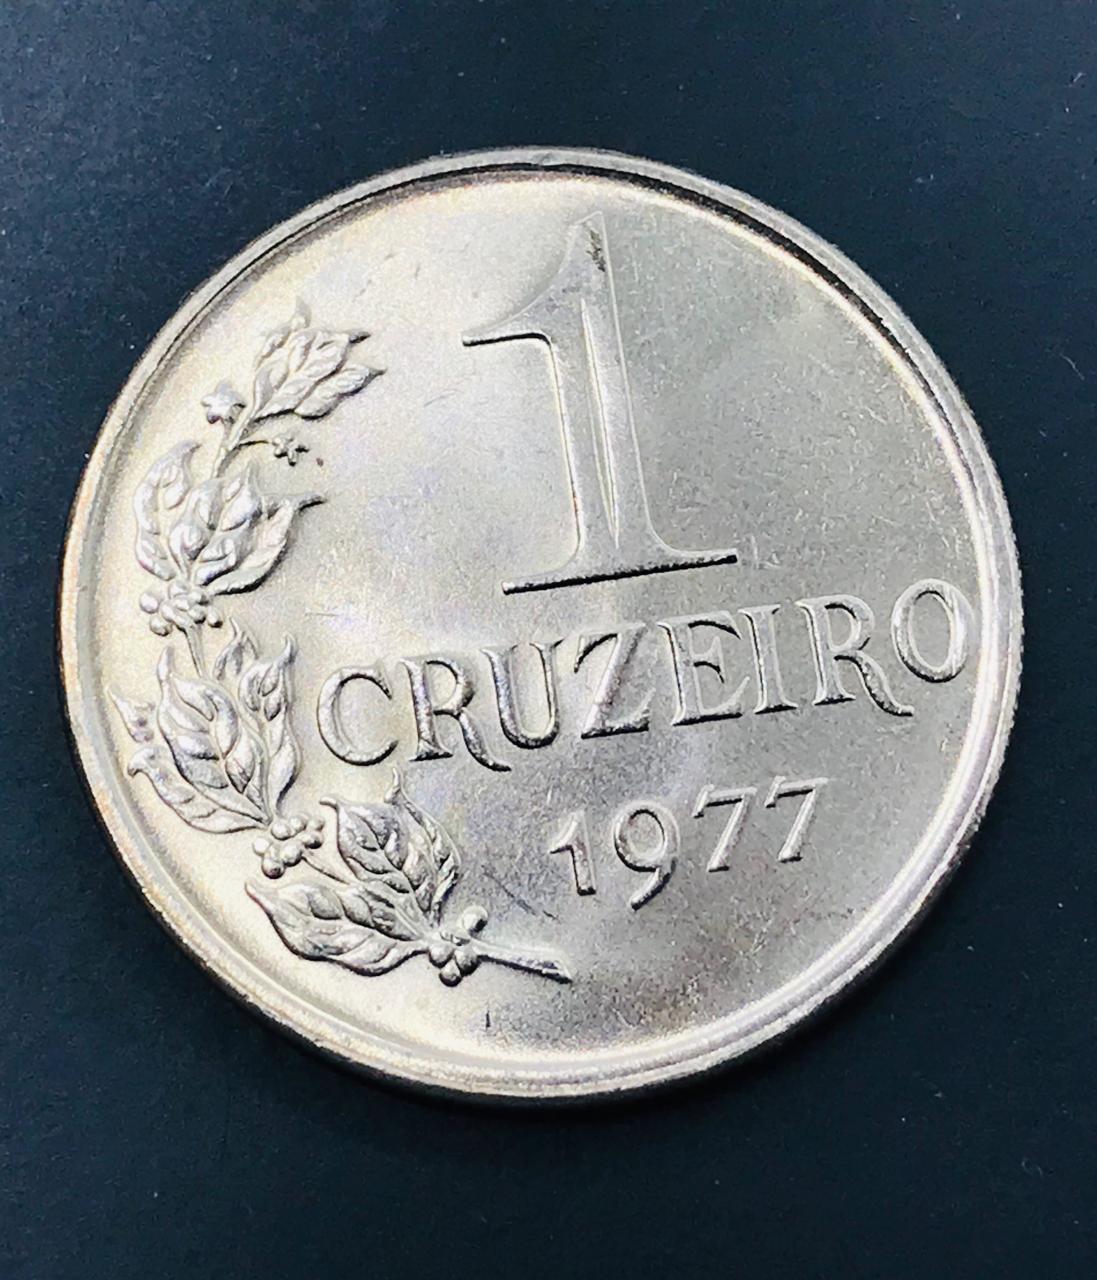 1 CRUZEIRO 1977